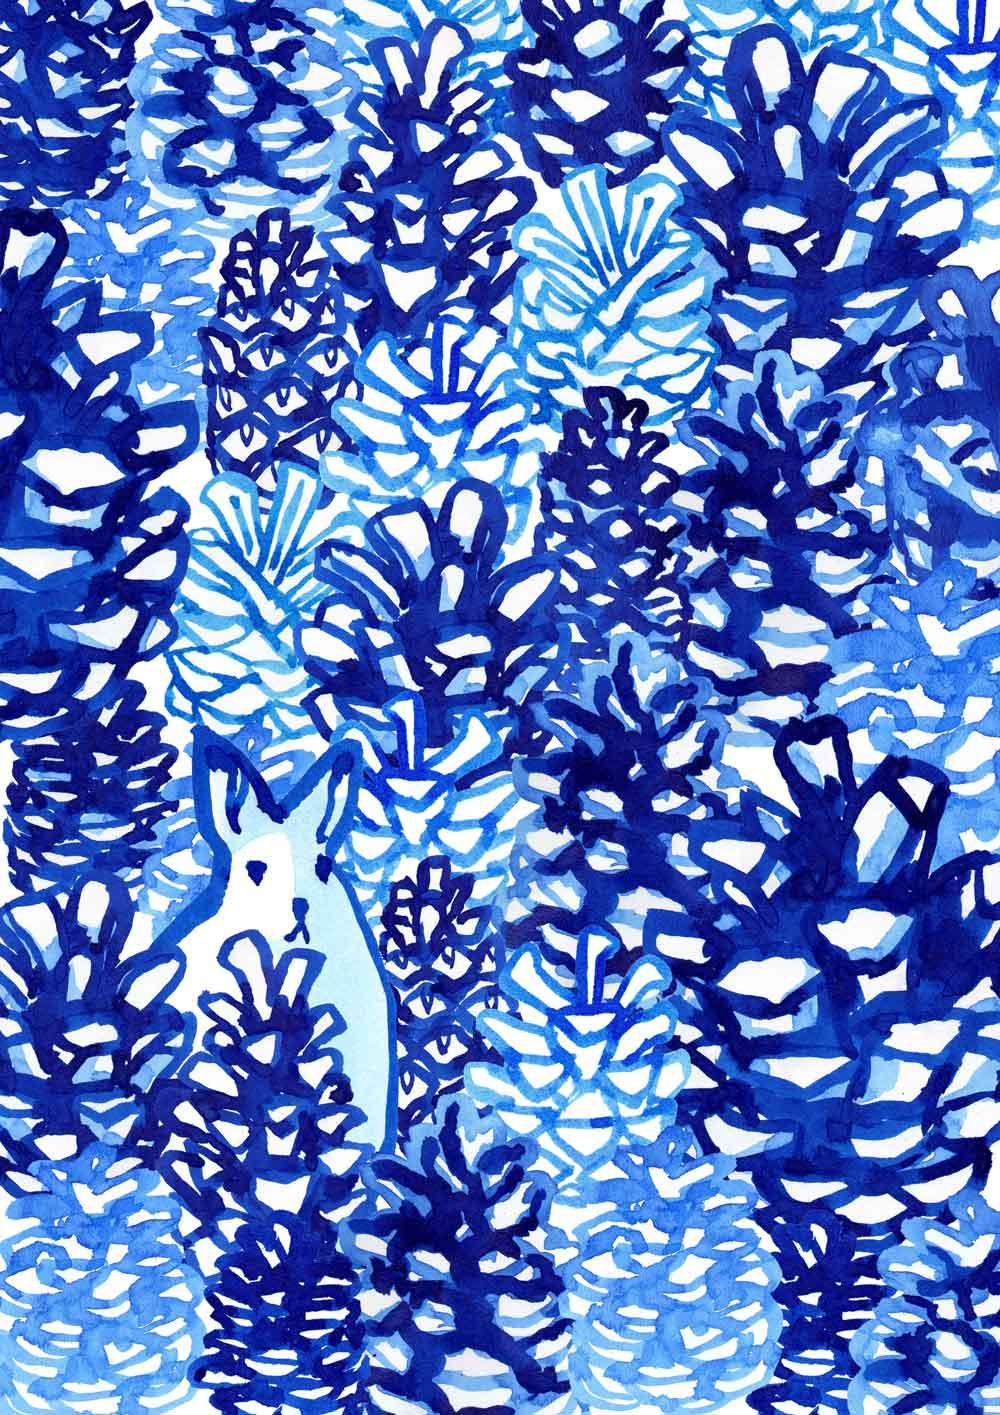 Beatrice Brandt Illustration6